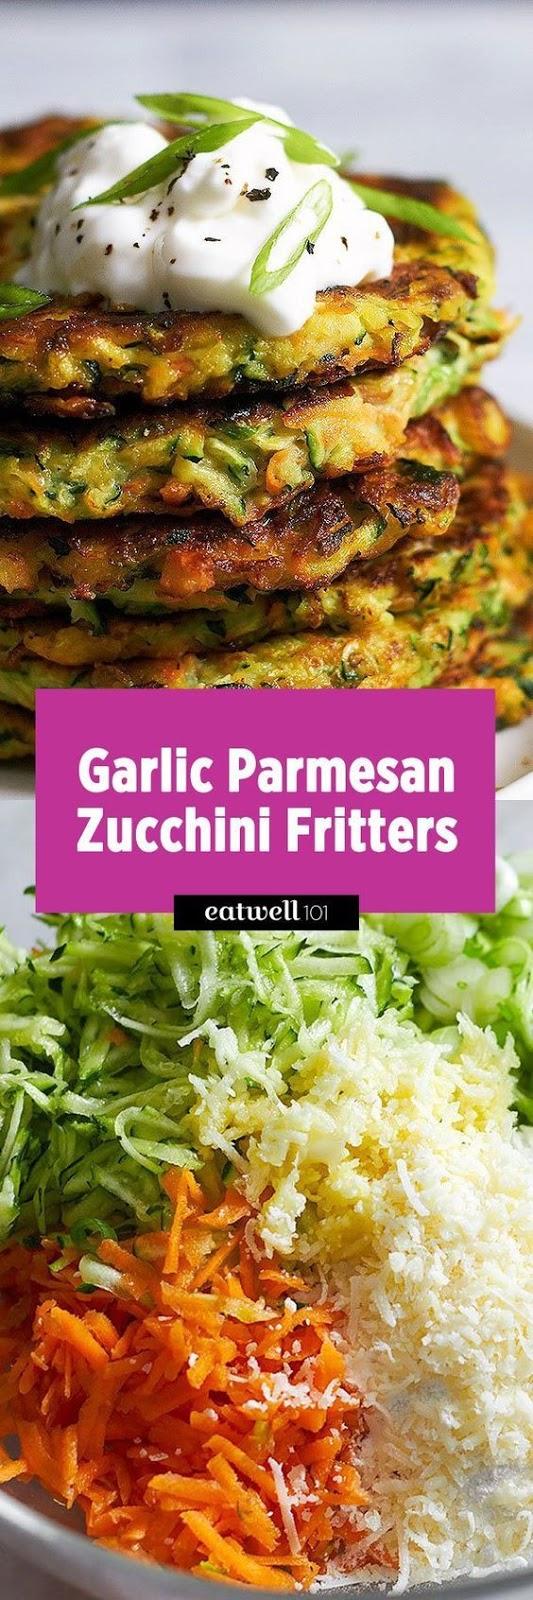 Crispy Garlic Parmesan Zucchini Fritters #crispy #garlic #parmesan #zucchini #fritters #healthysnack #healthyfood #healthyrecipes #snackrecipes #easysnackrecipes